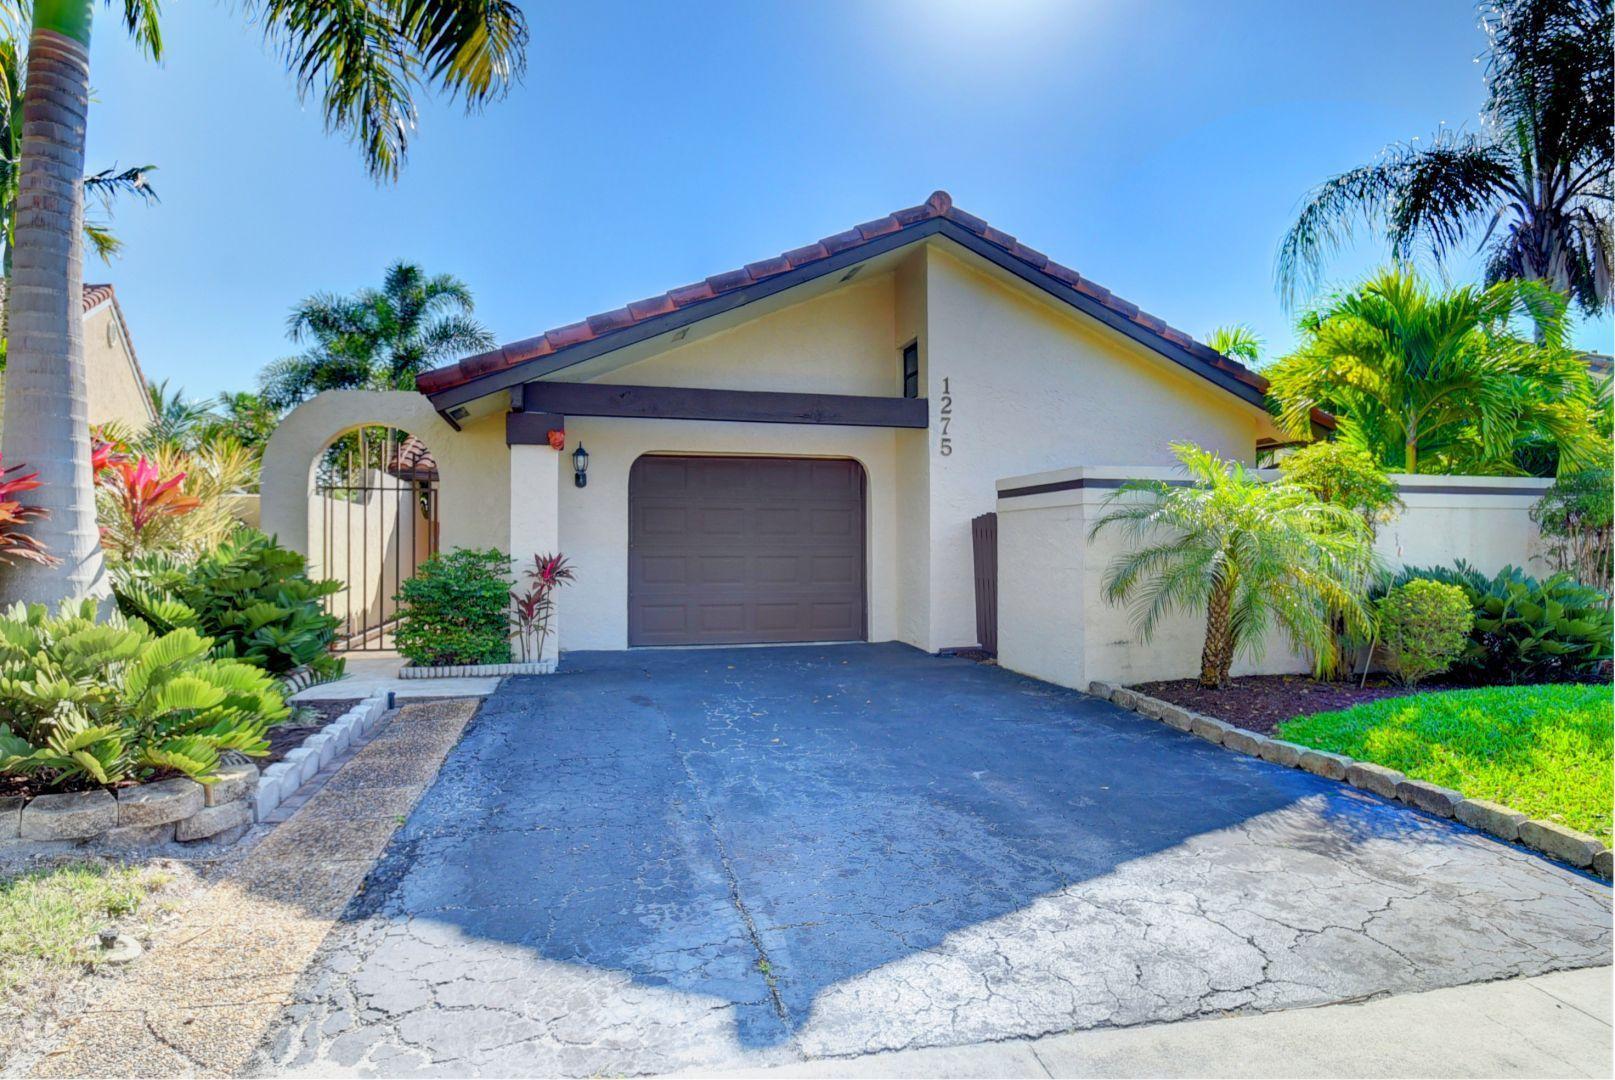 1275 Nw 21st Terrace, Delray Beach, FL 33445